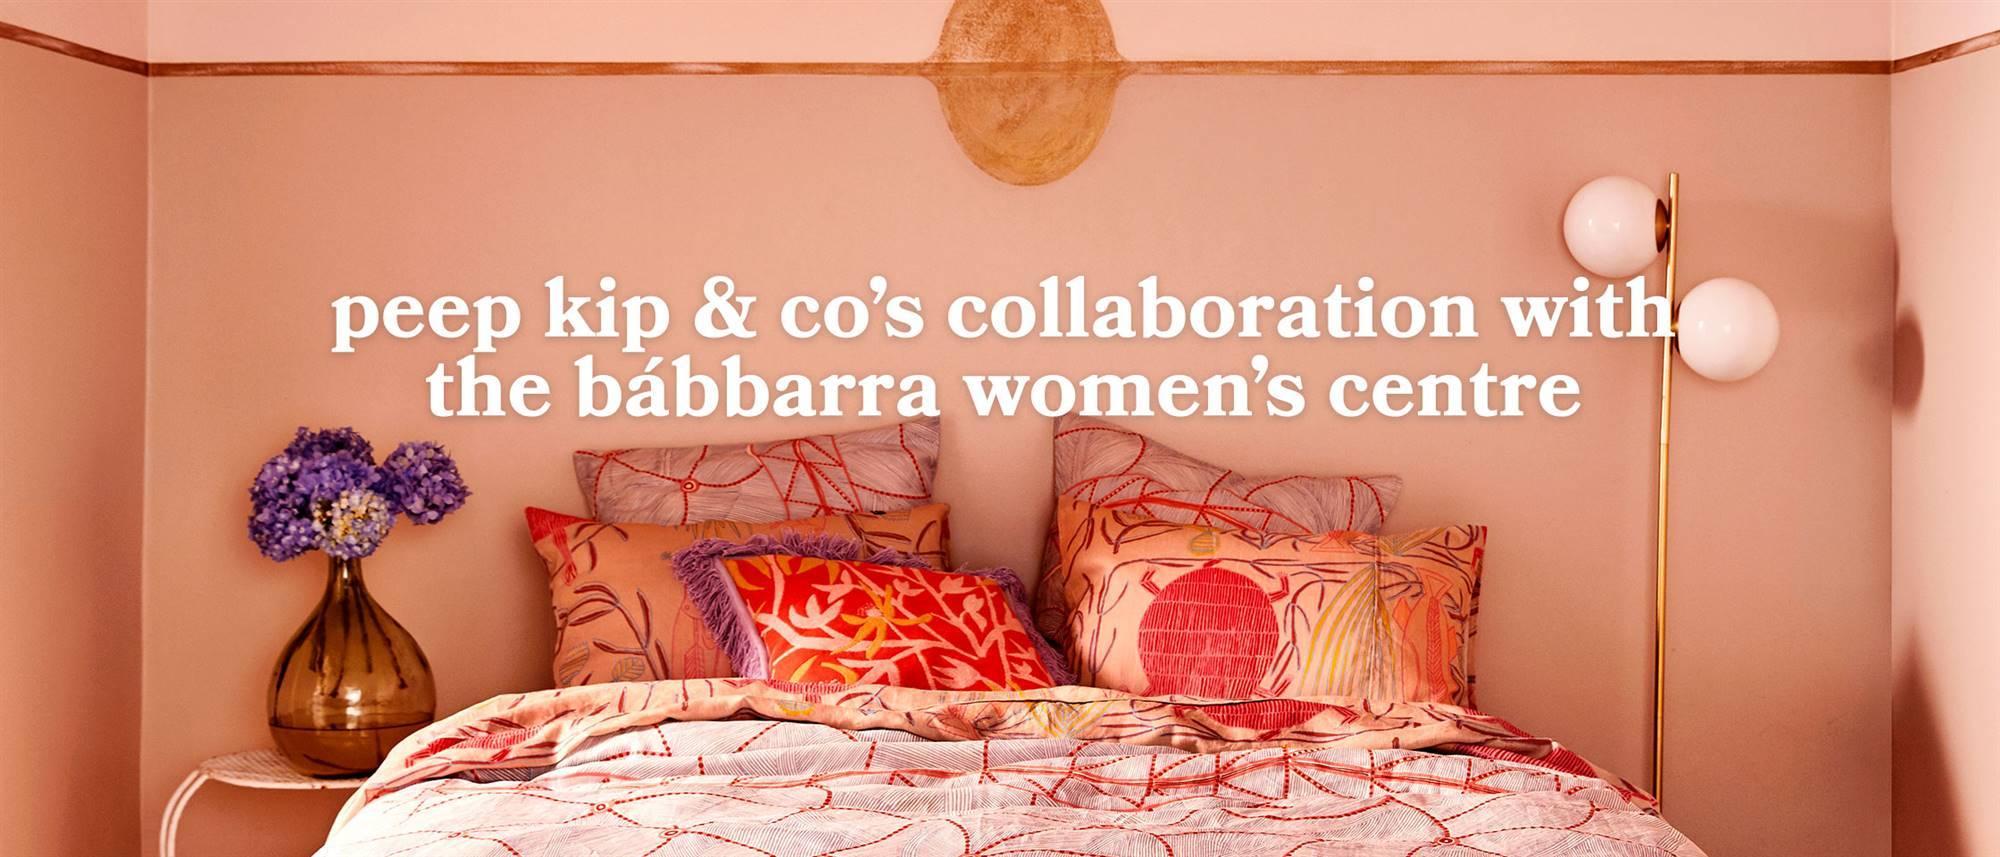 babbarra home page